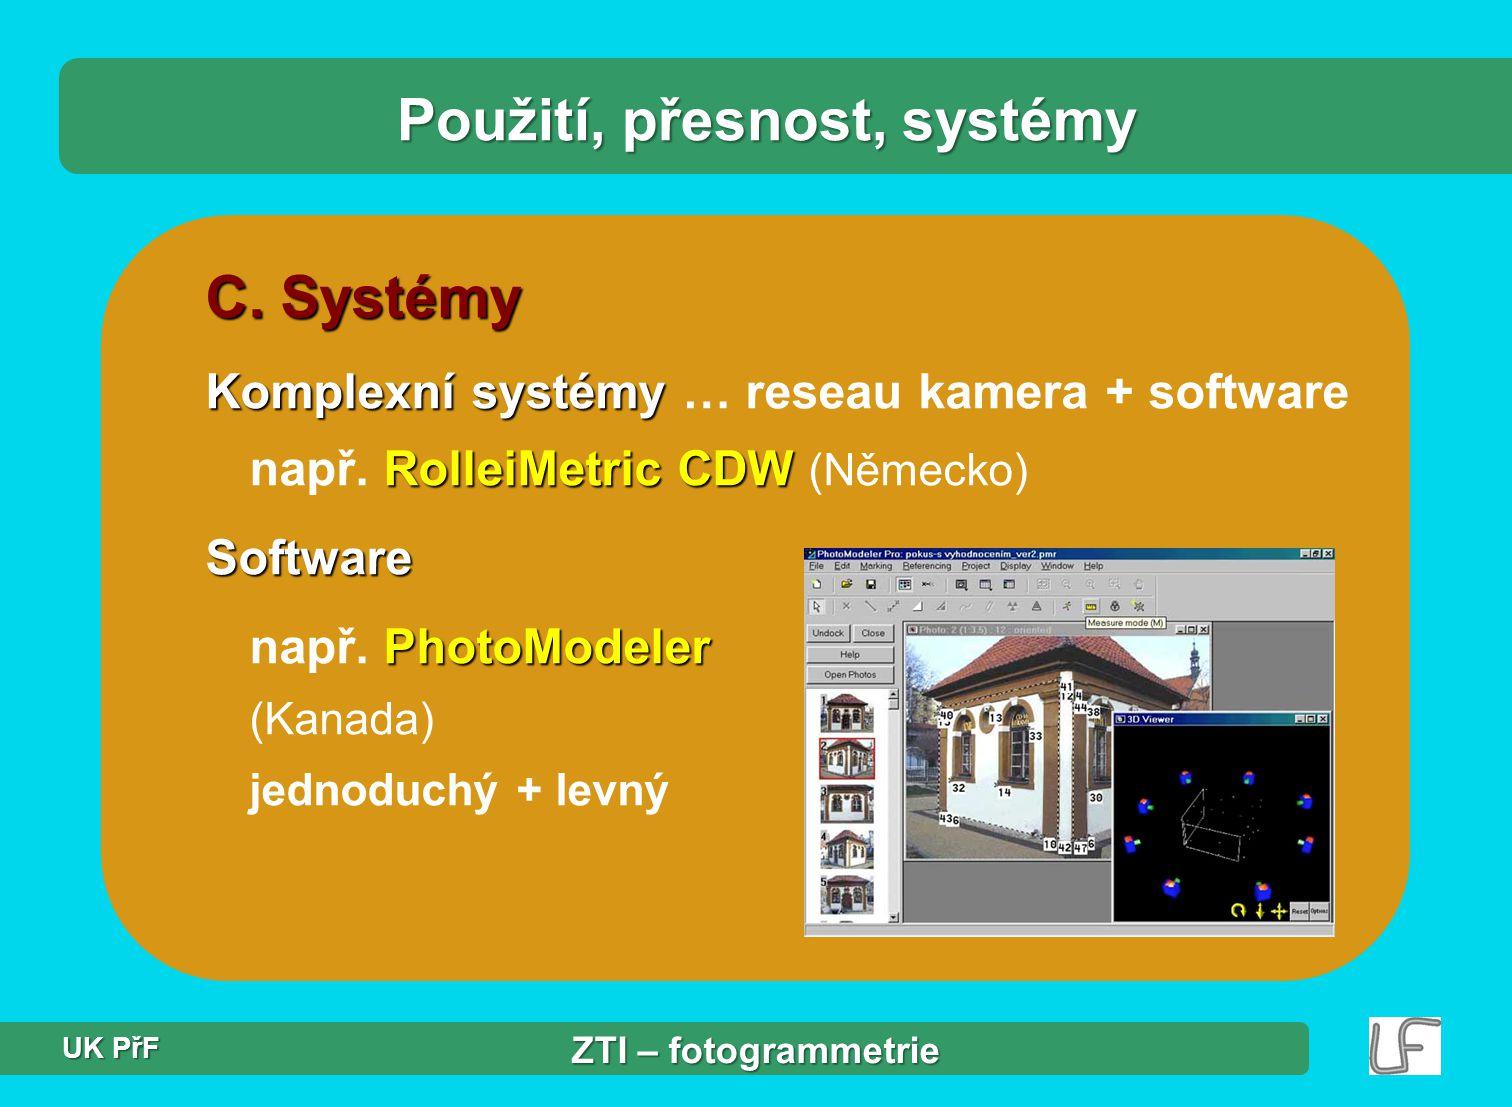 C.Systémy Komplexní systémy Komplexní systémy … reseau kamera + software RolleiMetric CDW např.